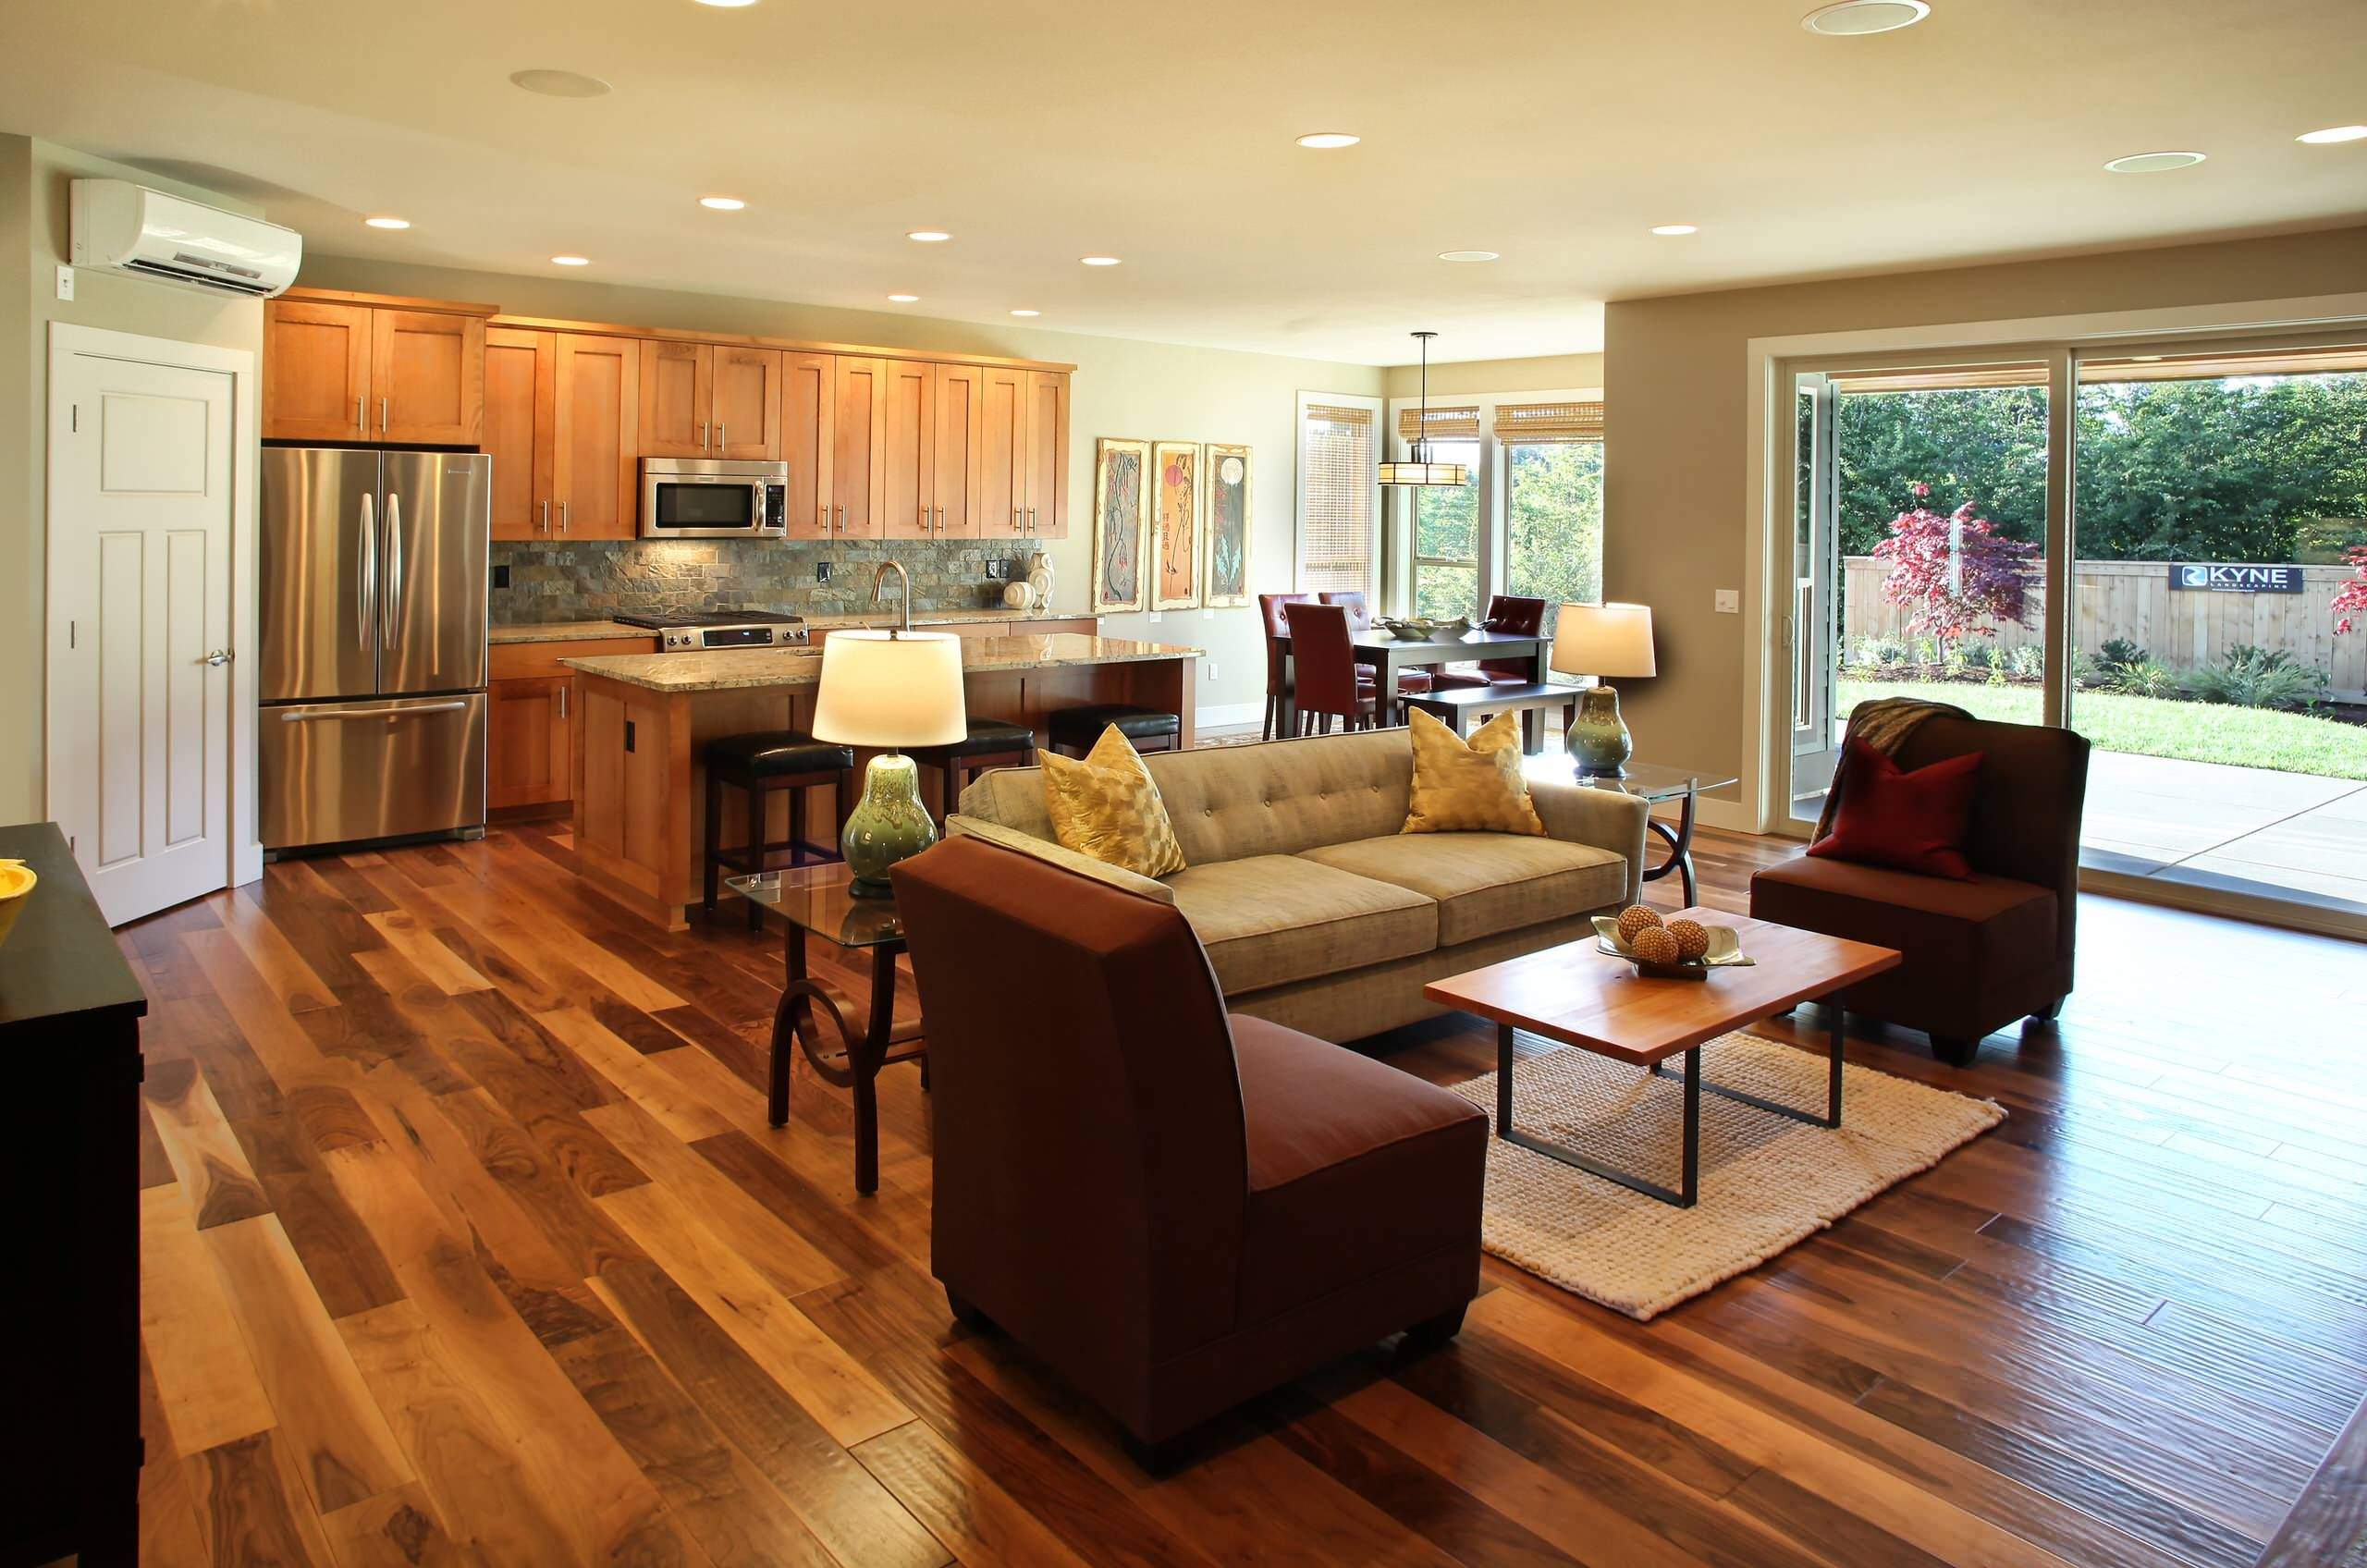 remodeled galley kitchen design ideas 2015 - Google Search